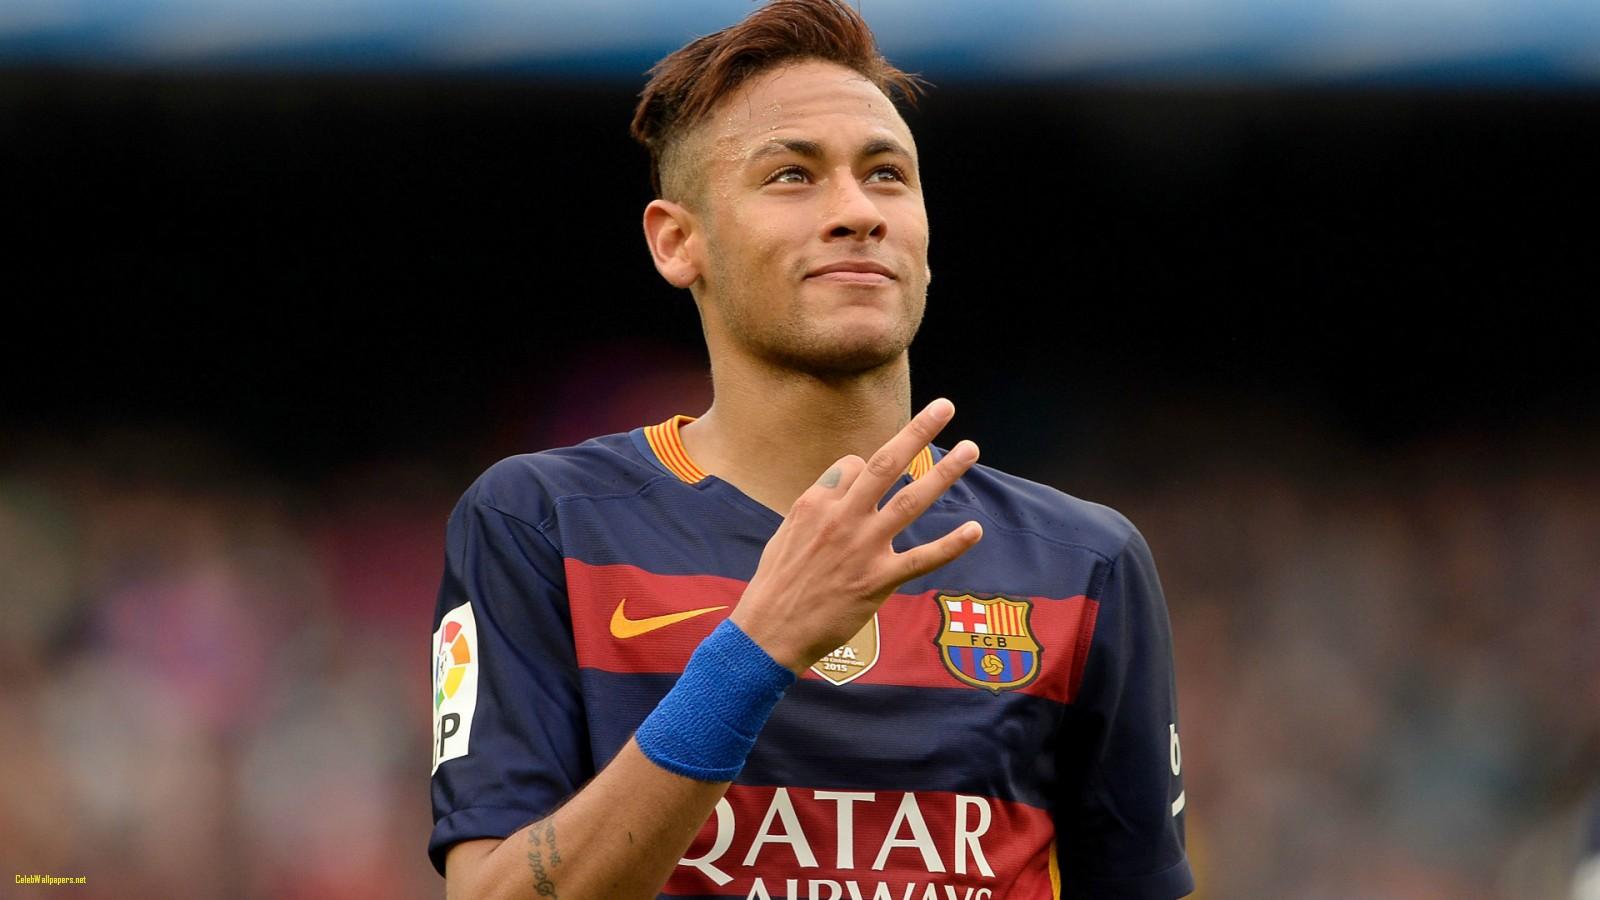 FC Barcelona Neymar Hd Wallpapers p Beautiful Neymar Wallpapers